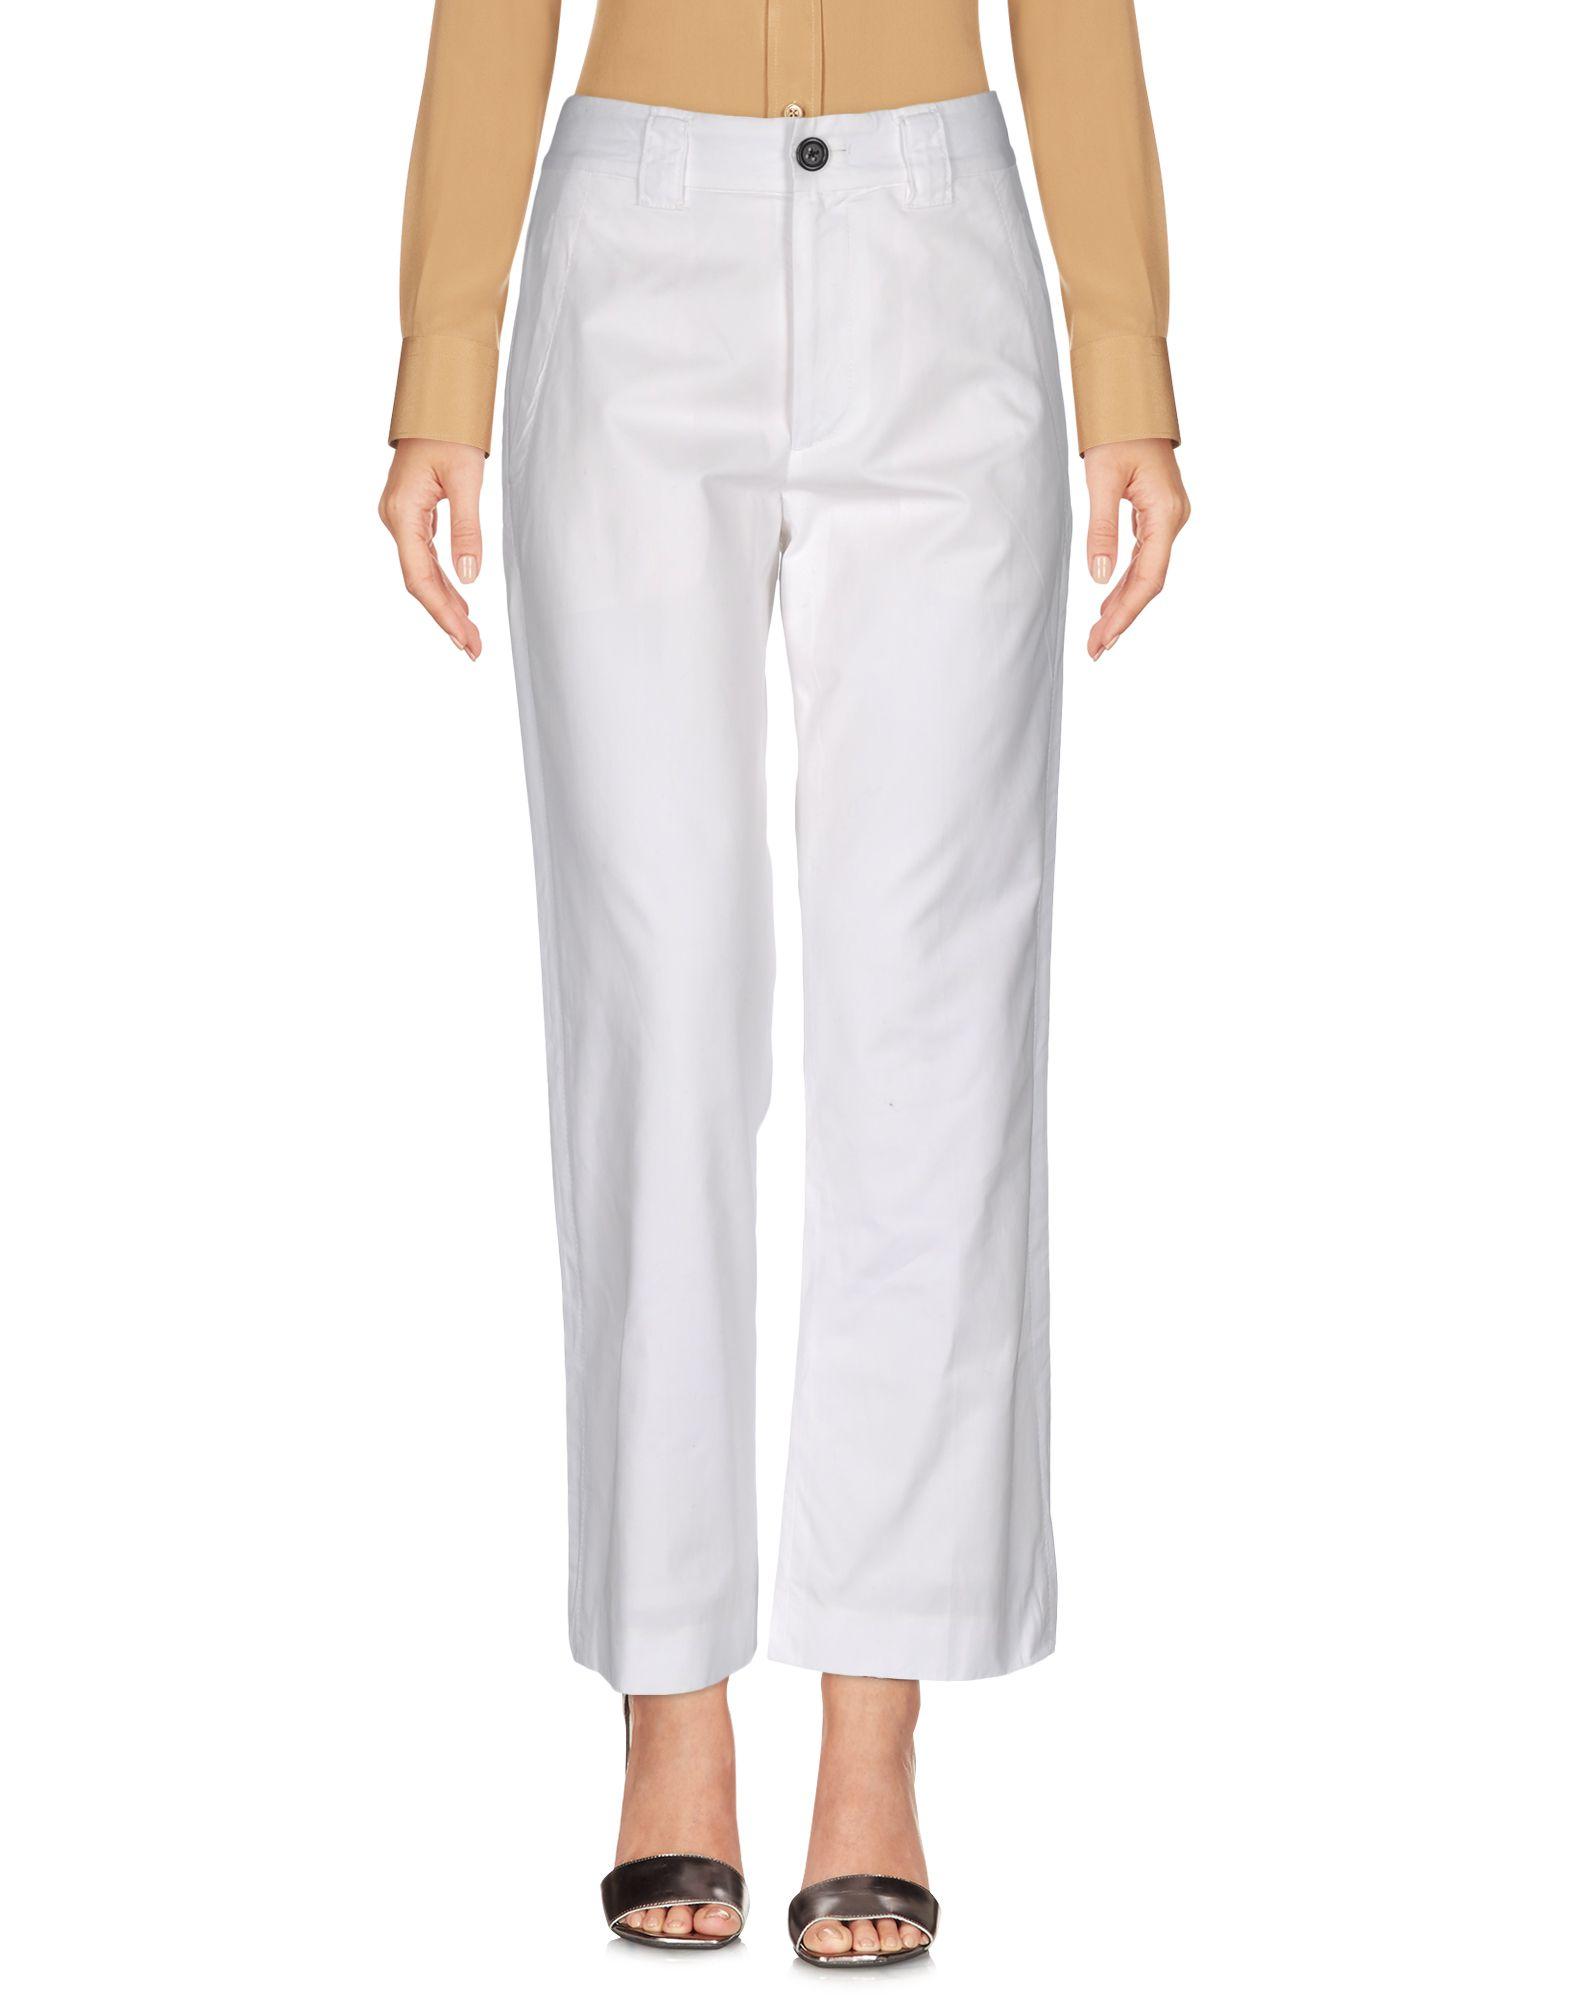 marc jacobs female marc jacobs casual pants